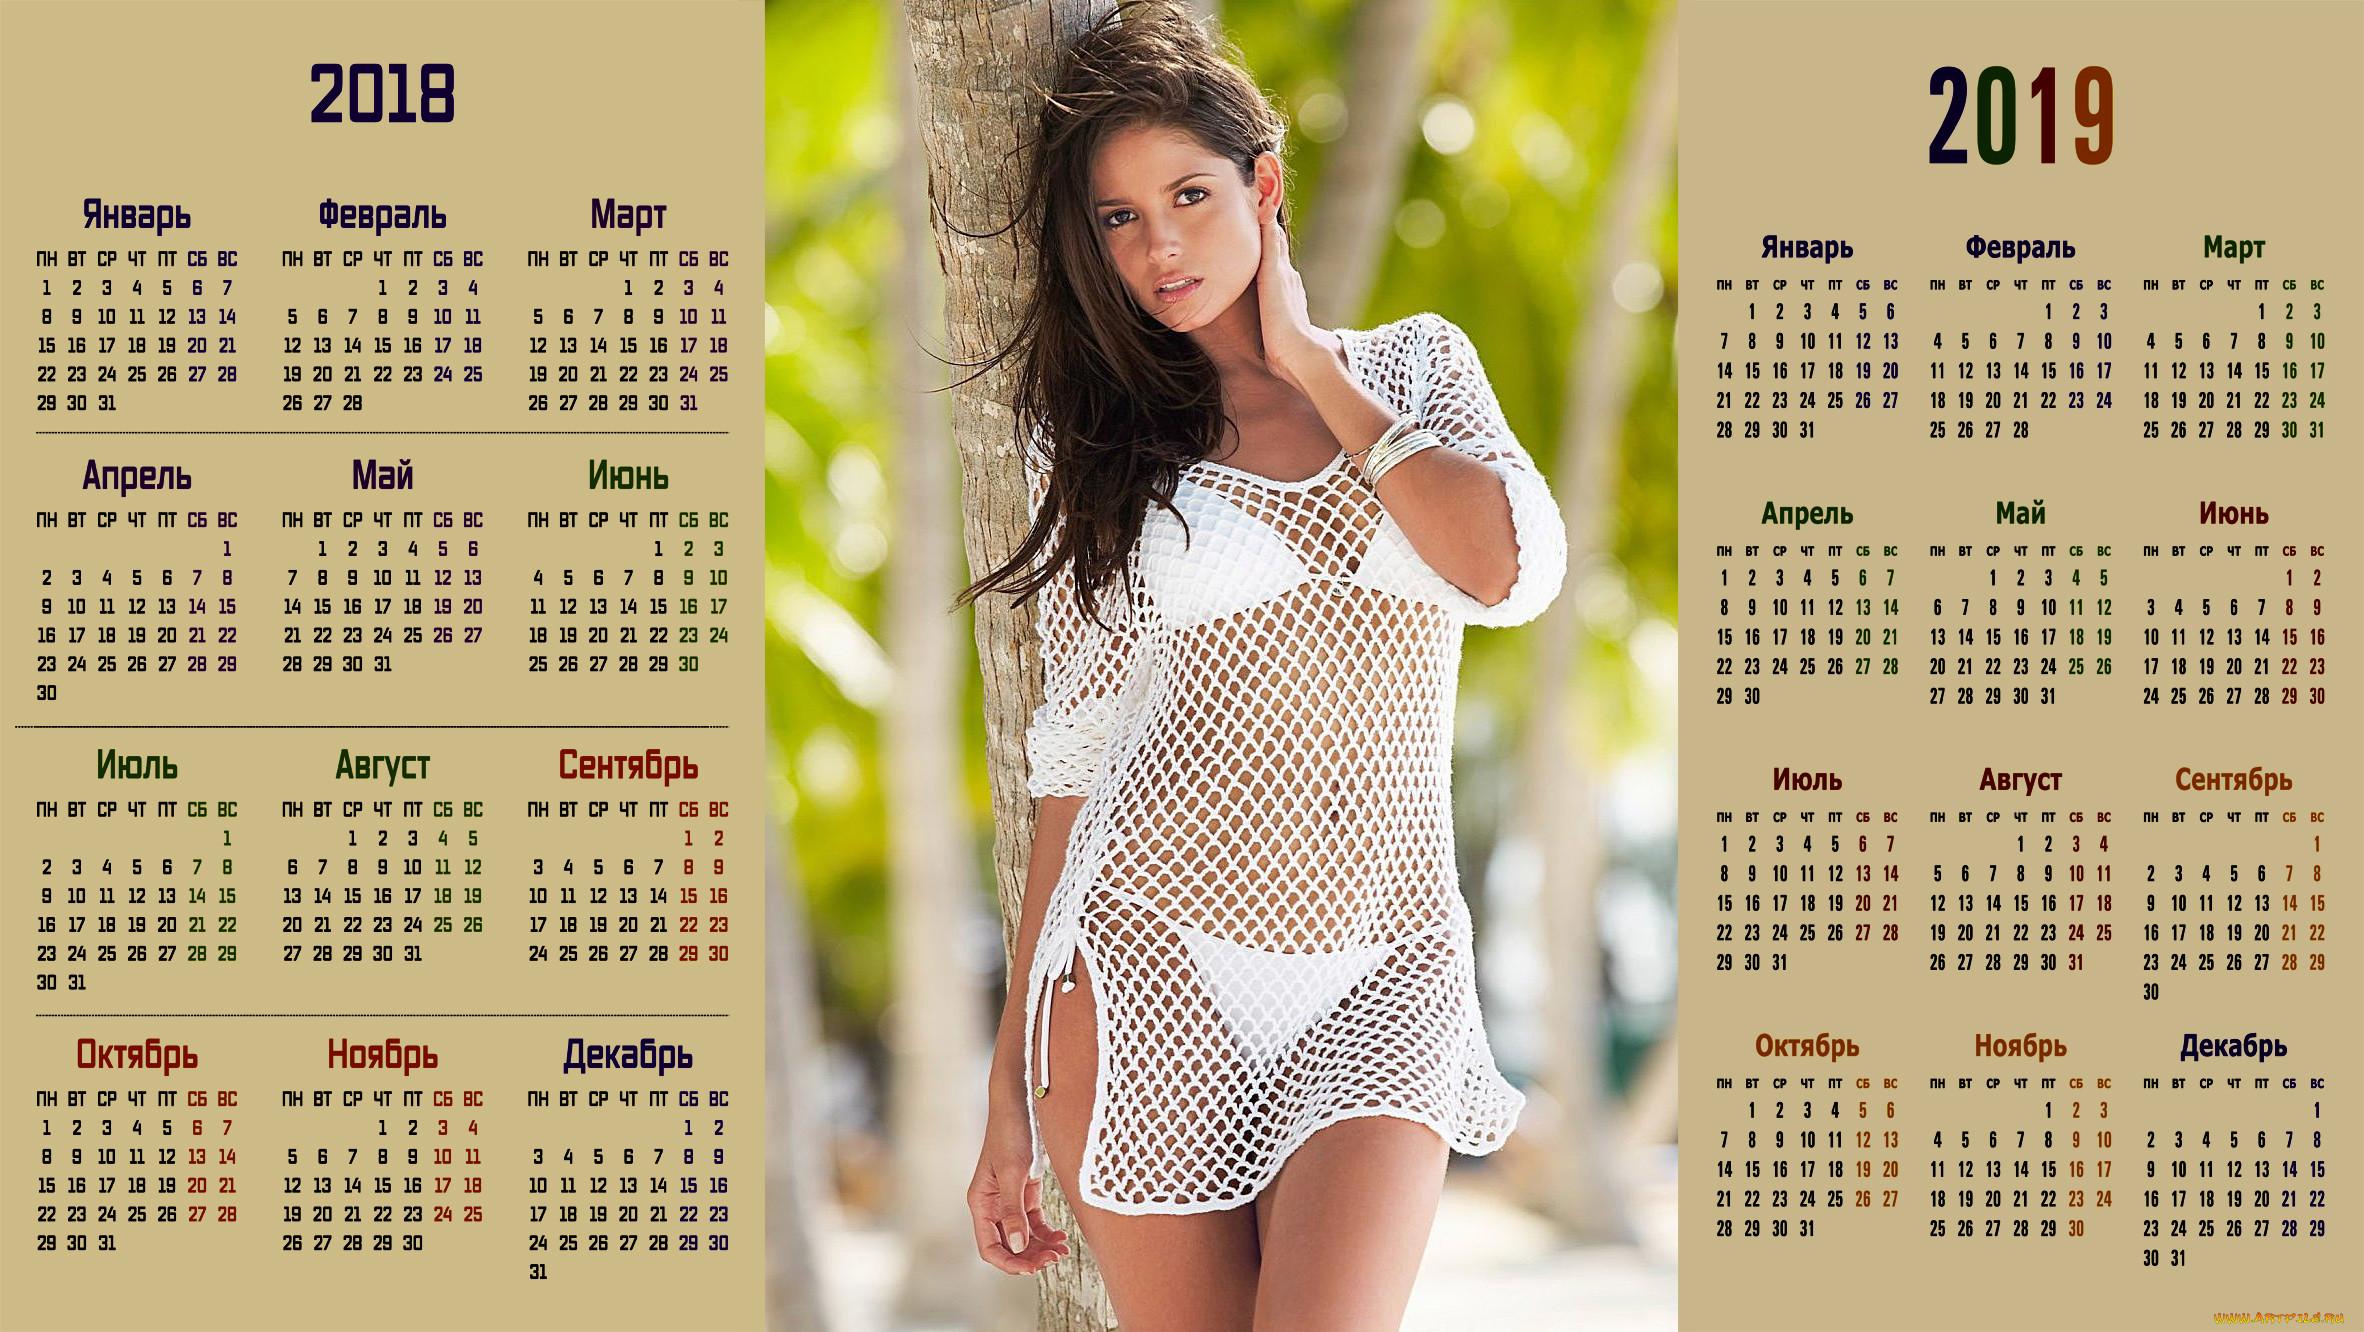 Календари без картинки